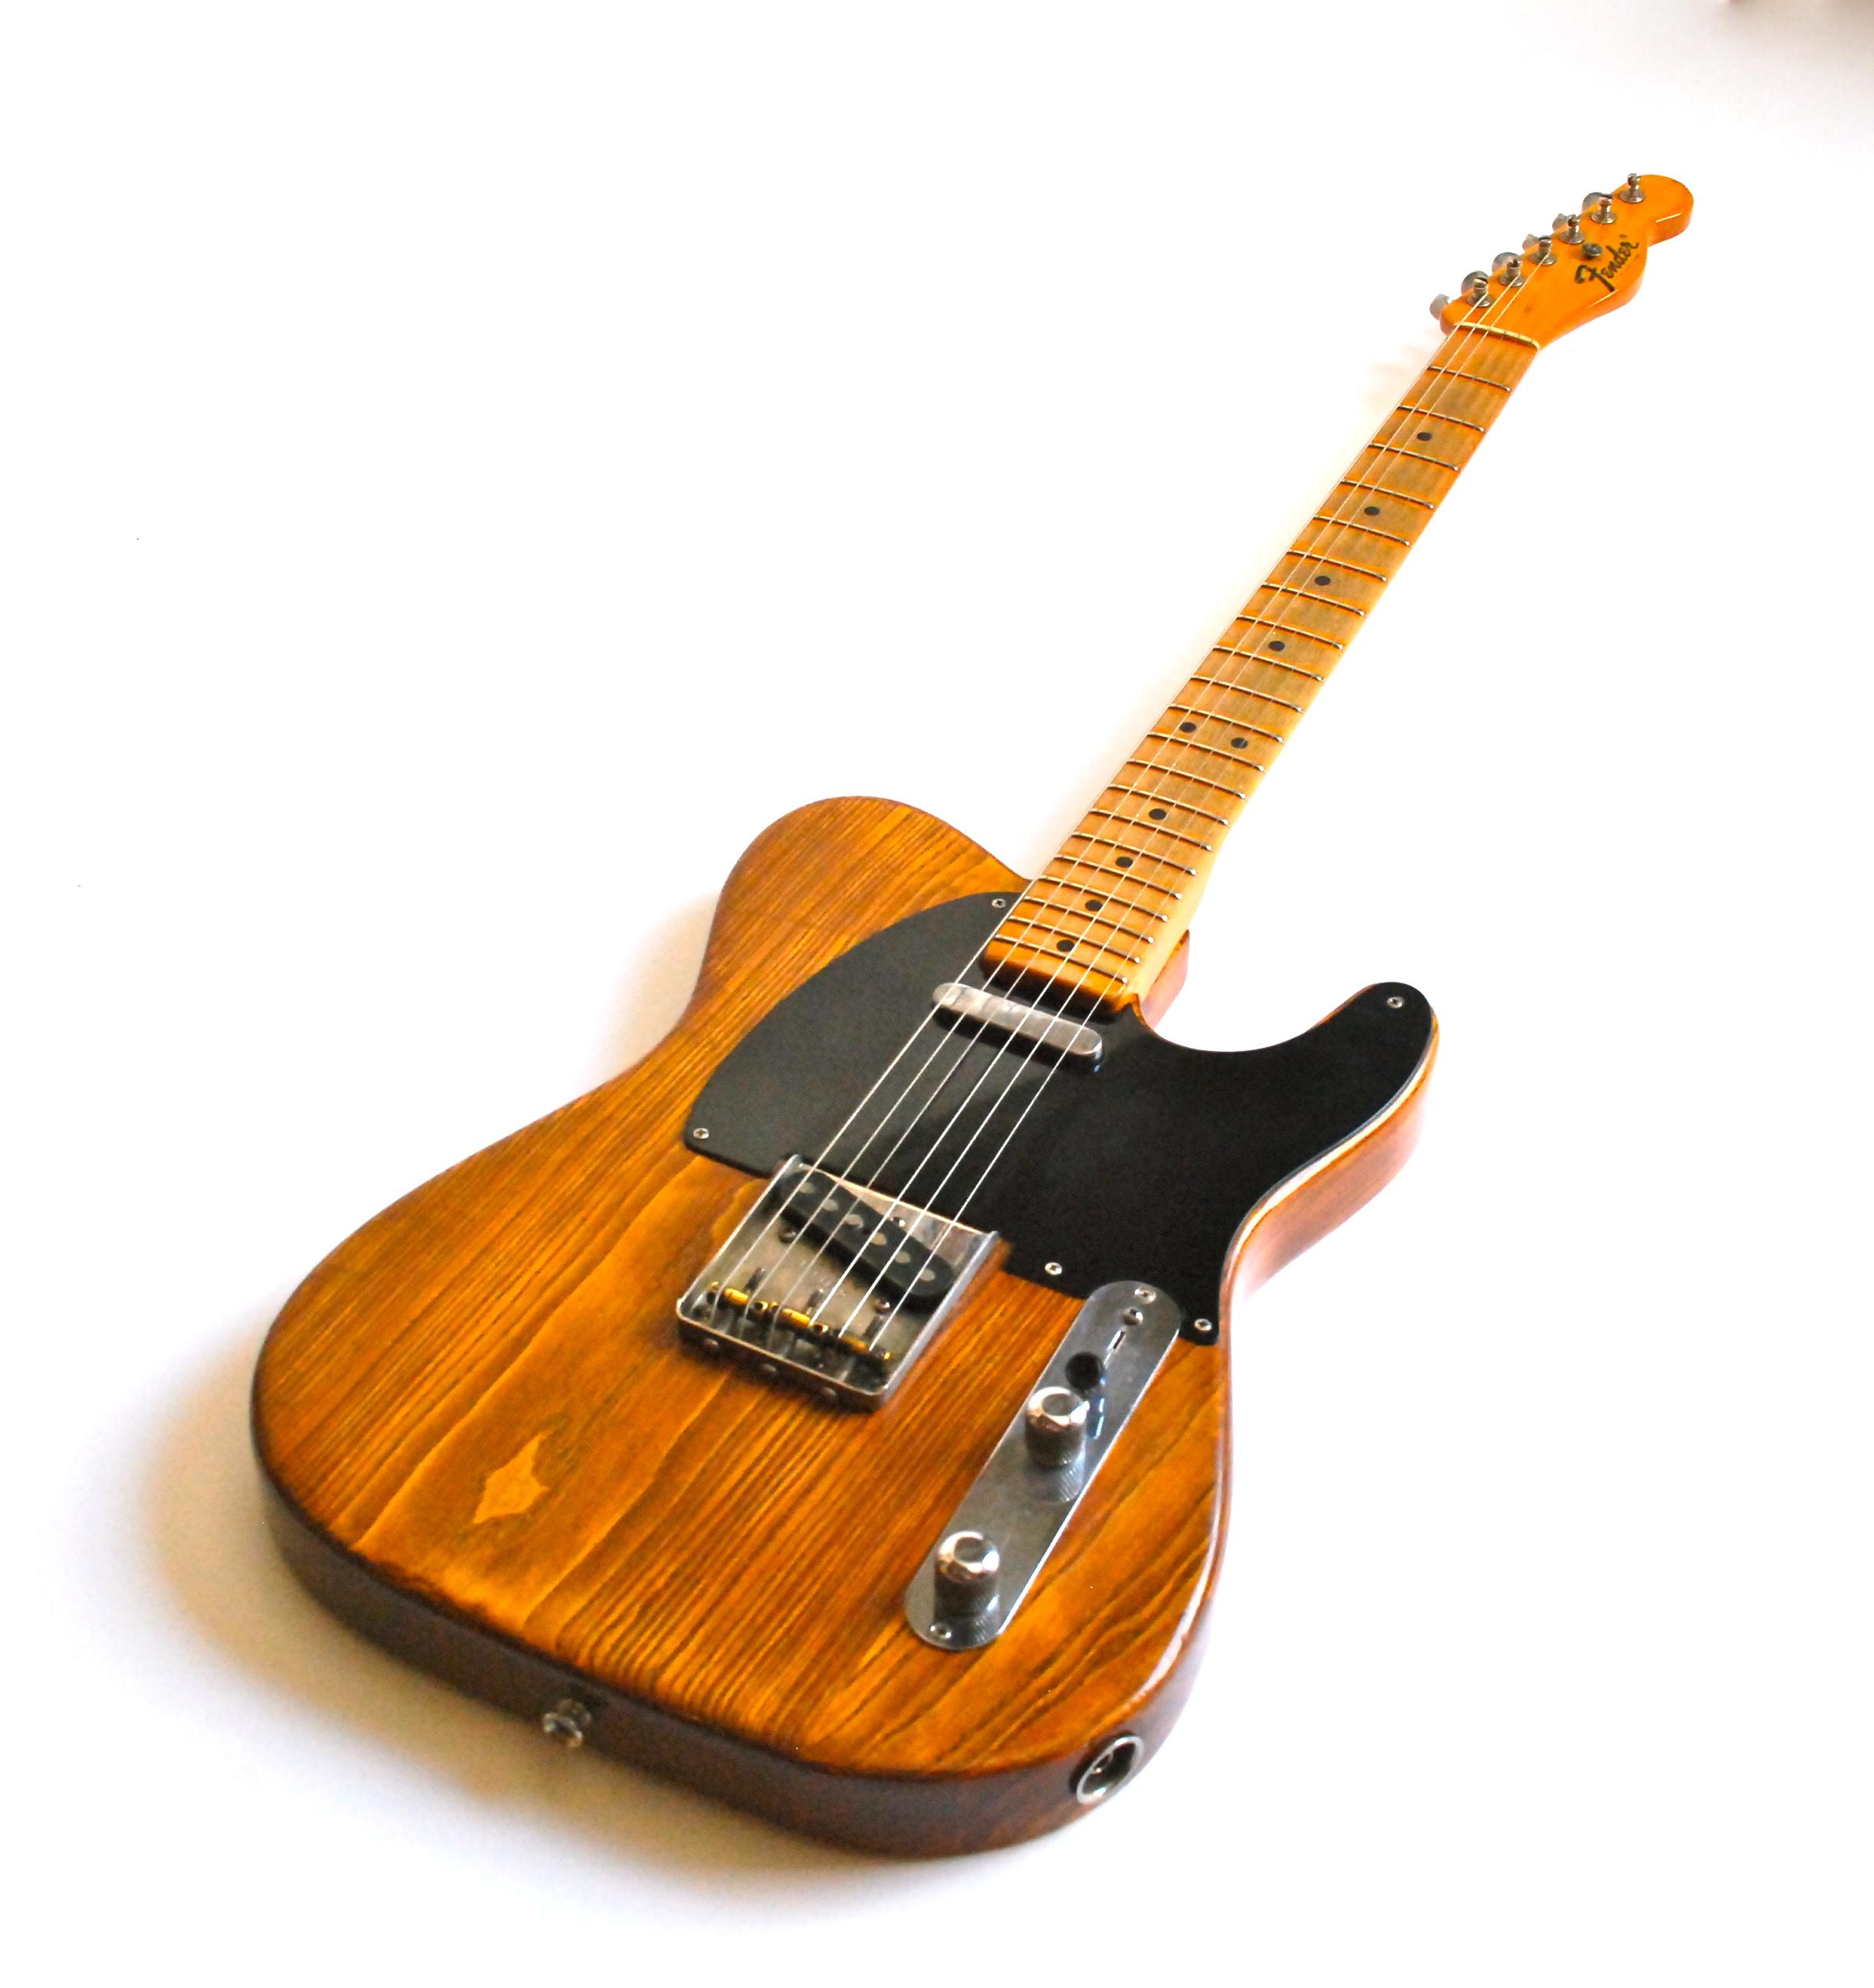 Fender Telecaster 1951 Natural Guitar For Sale Bass N Guitar